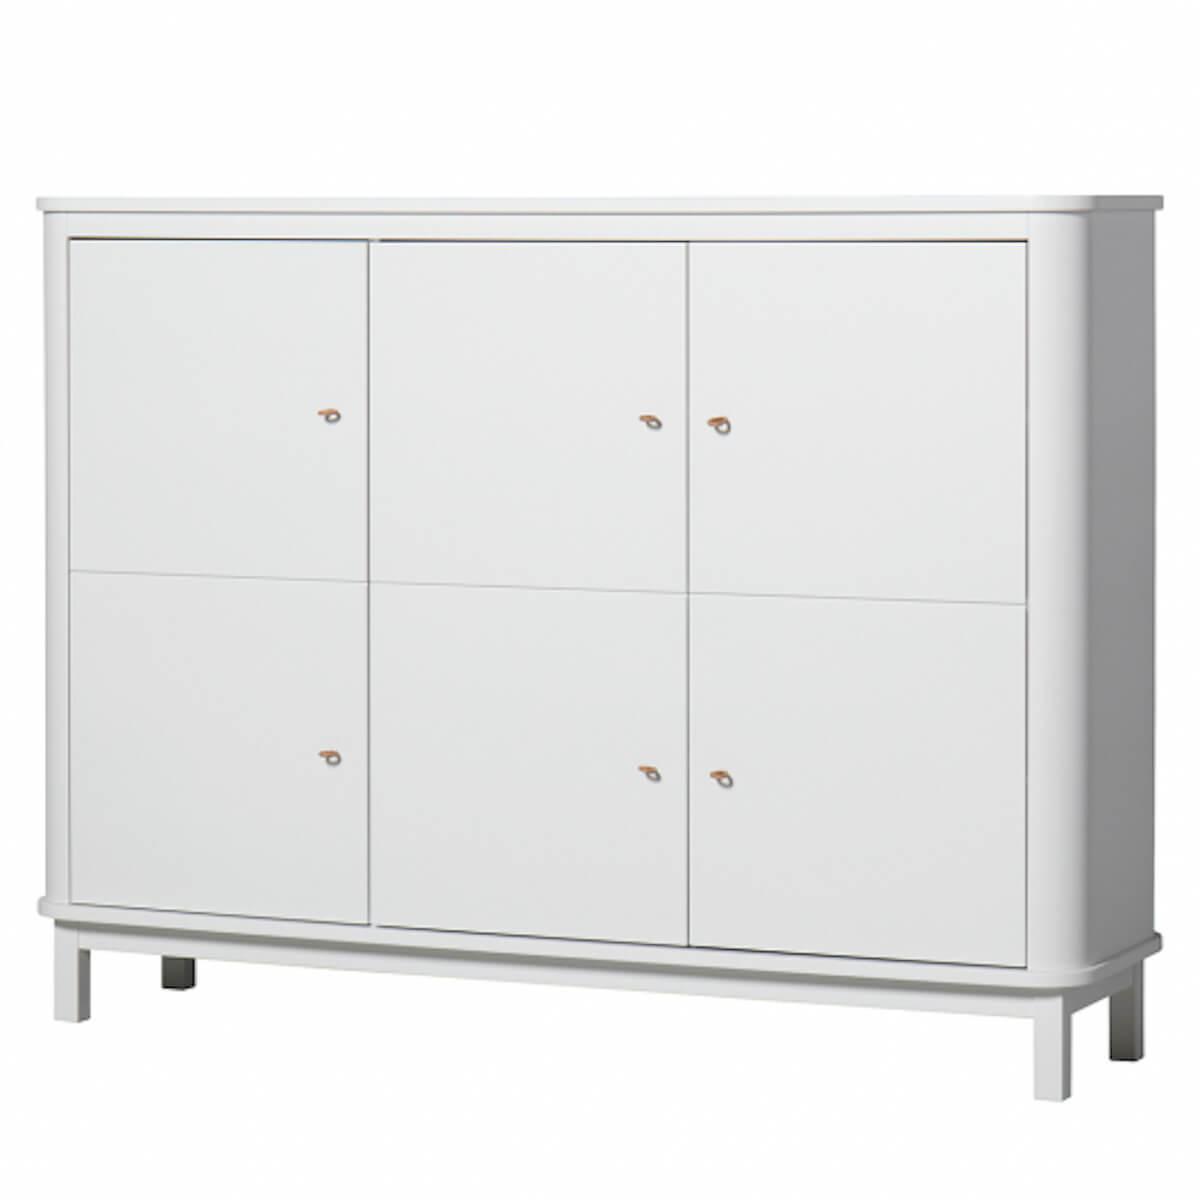 Armoire multi-rangement 3 portes WOOD Oliver Furniture blanc